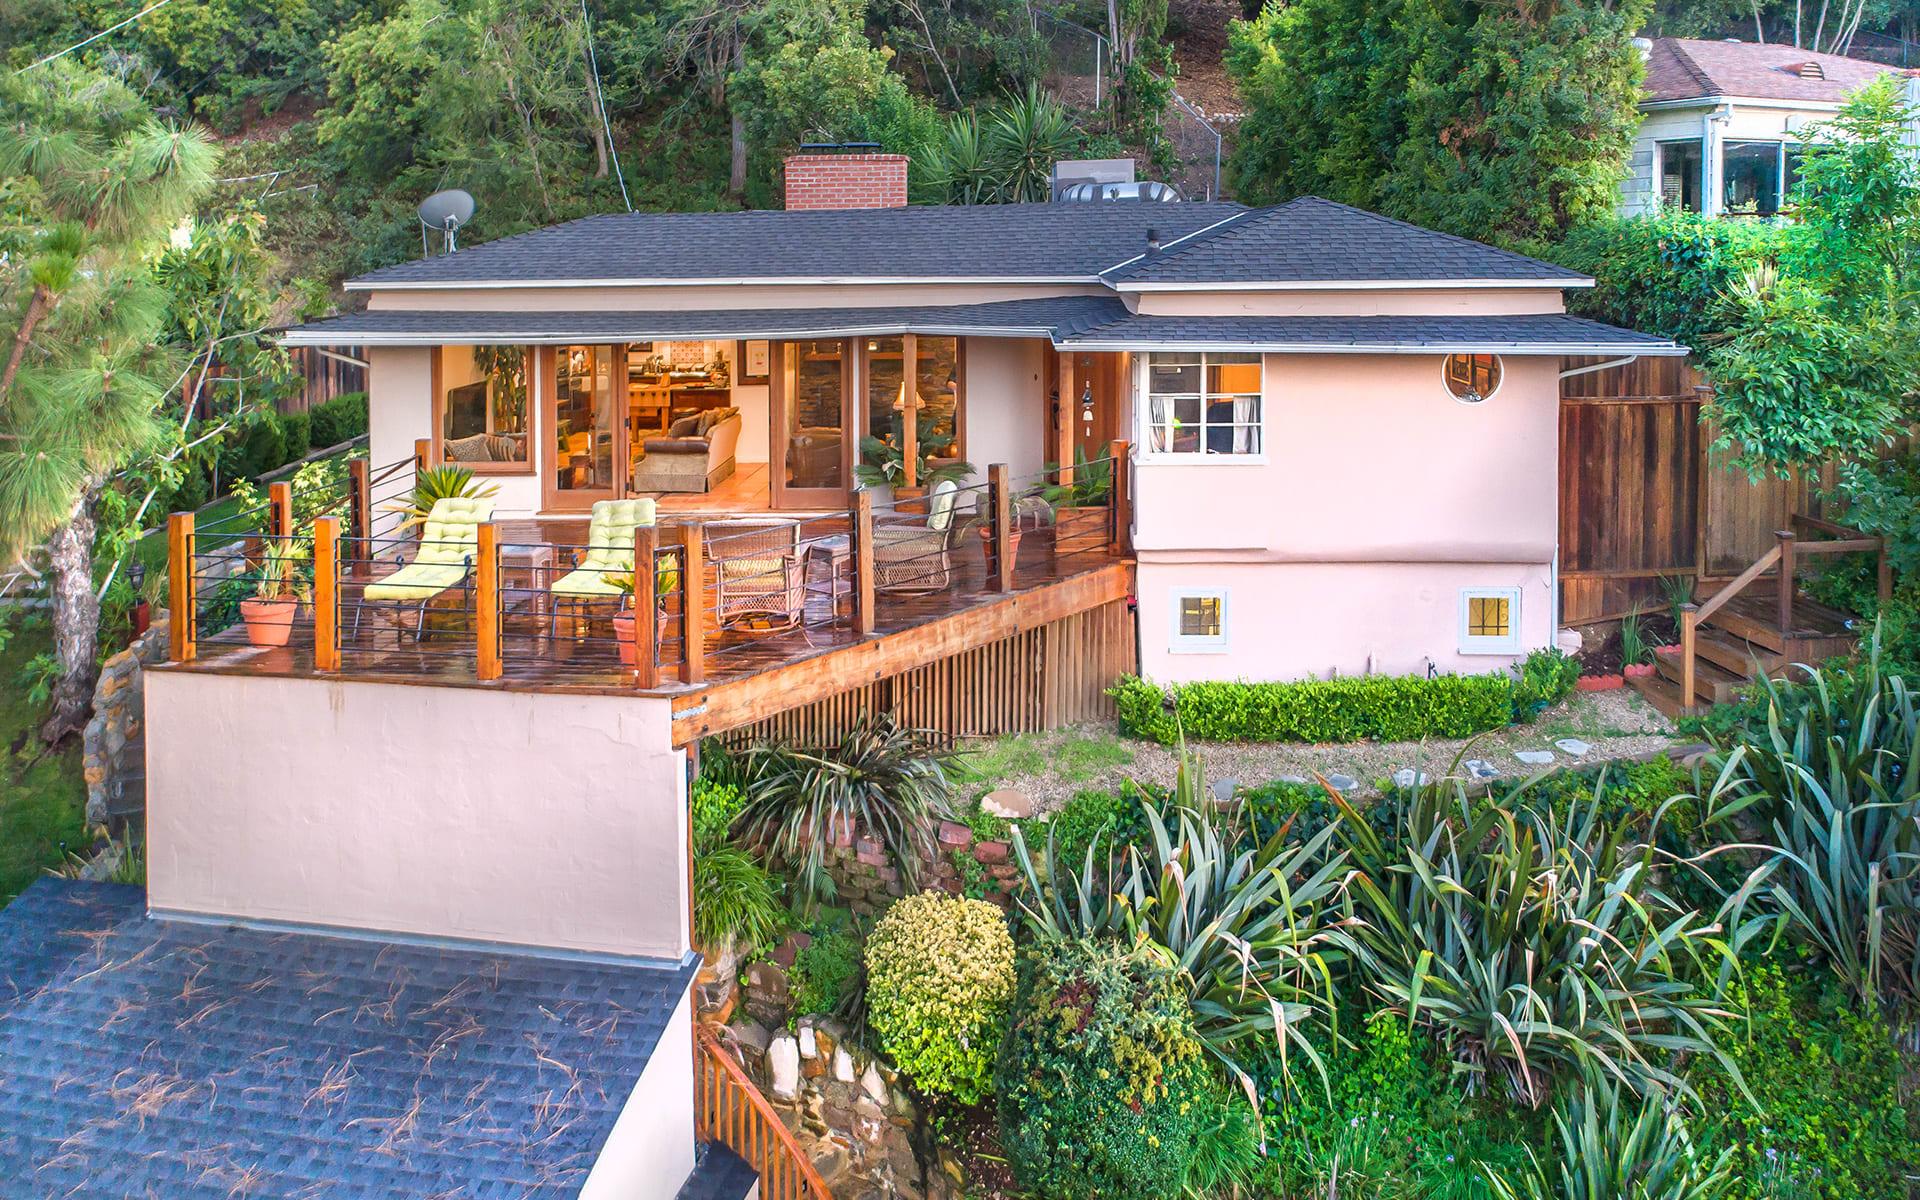 Casa Unifamiliar por un Venta en 11570 Sunshine Terrace 11570 Sunshine Terrace Studio City, California,91604 Estados Unidos